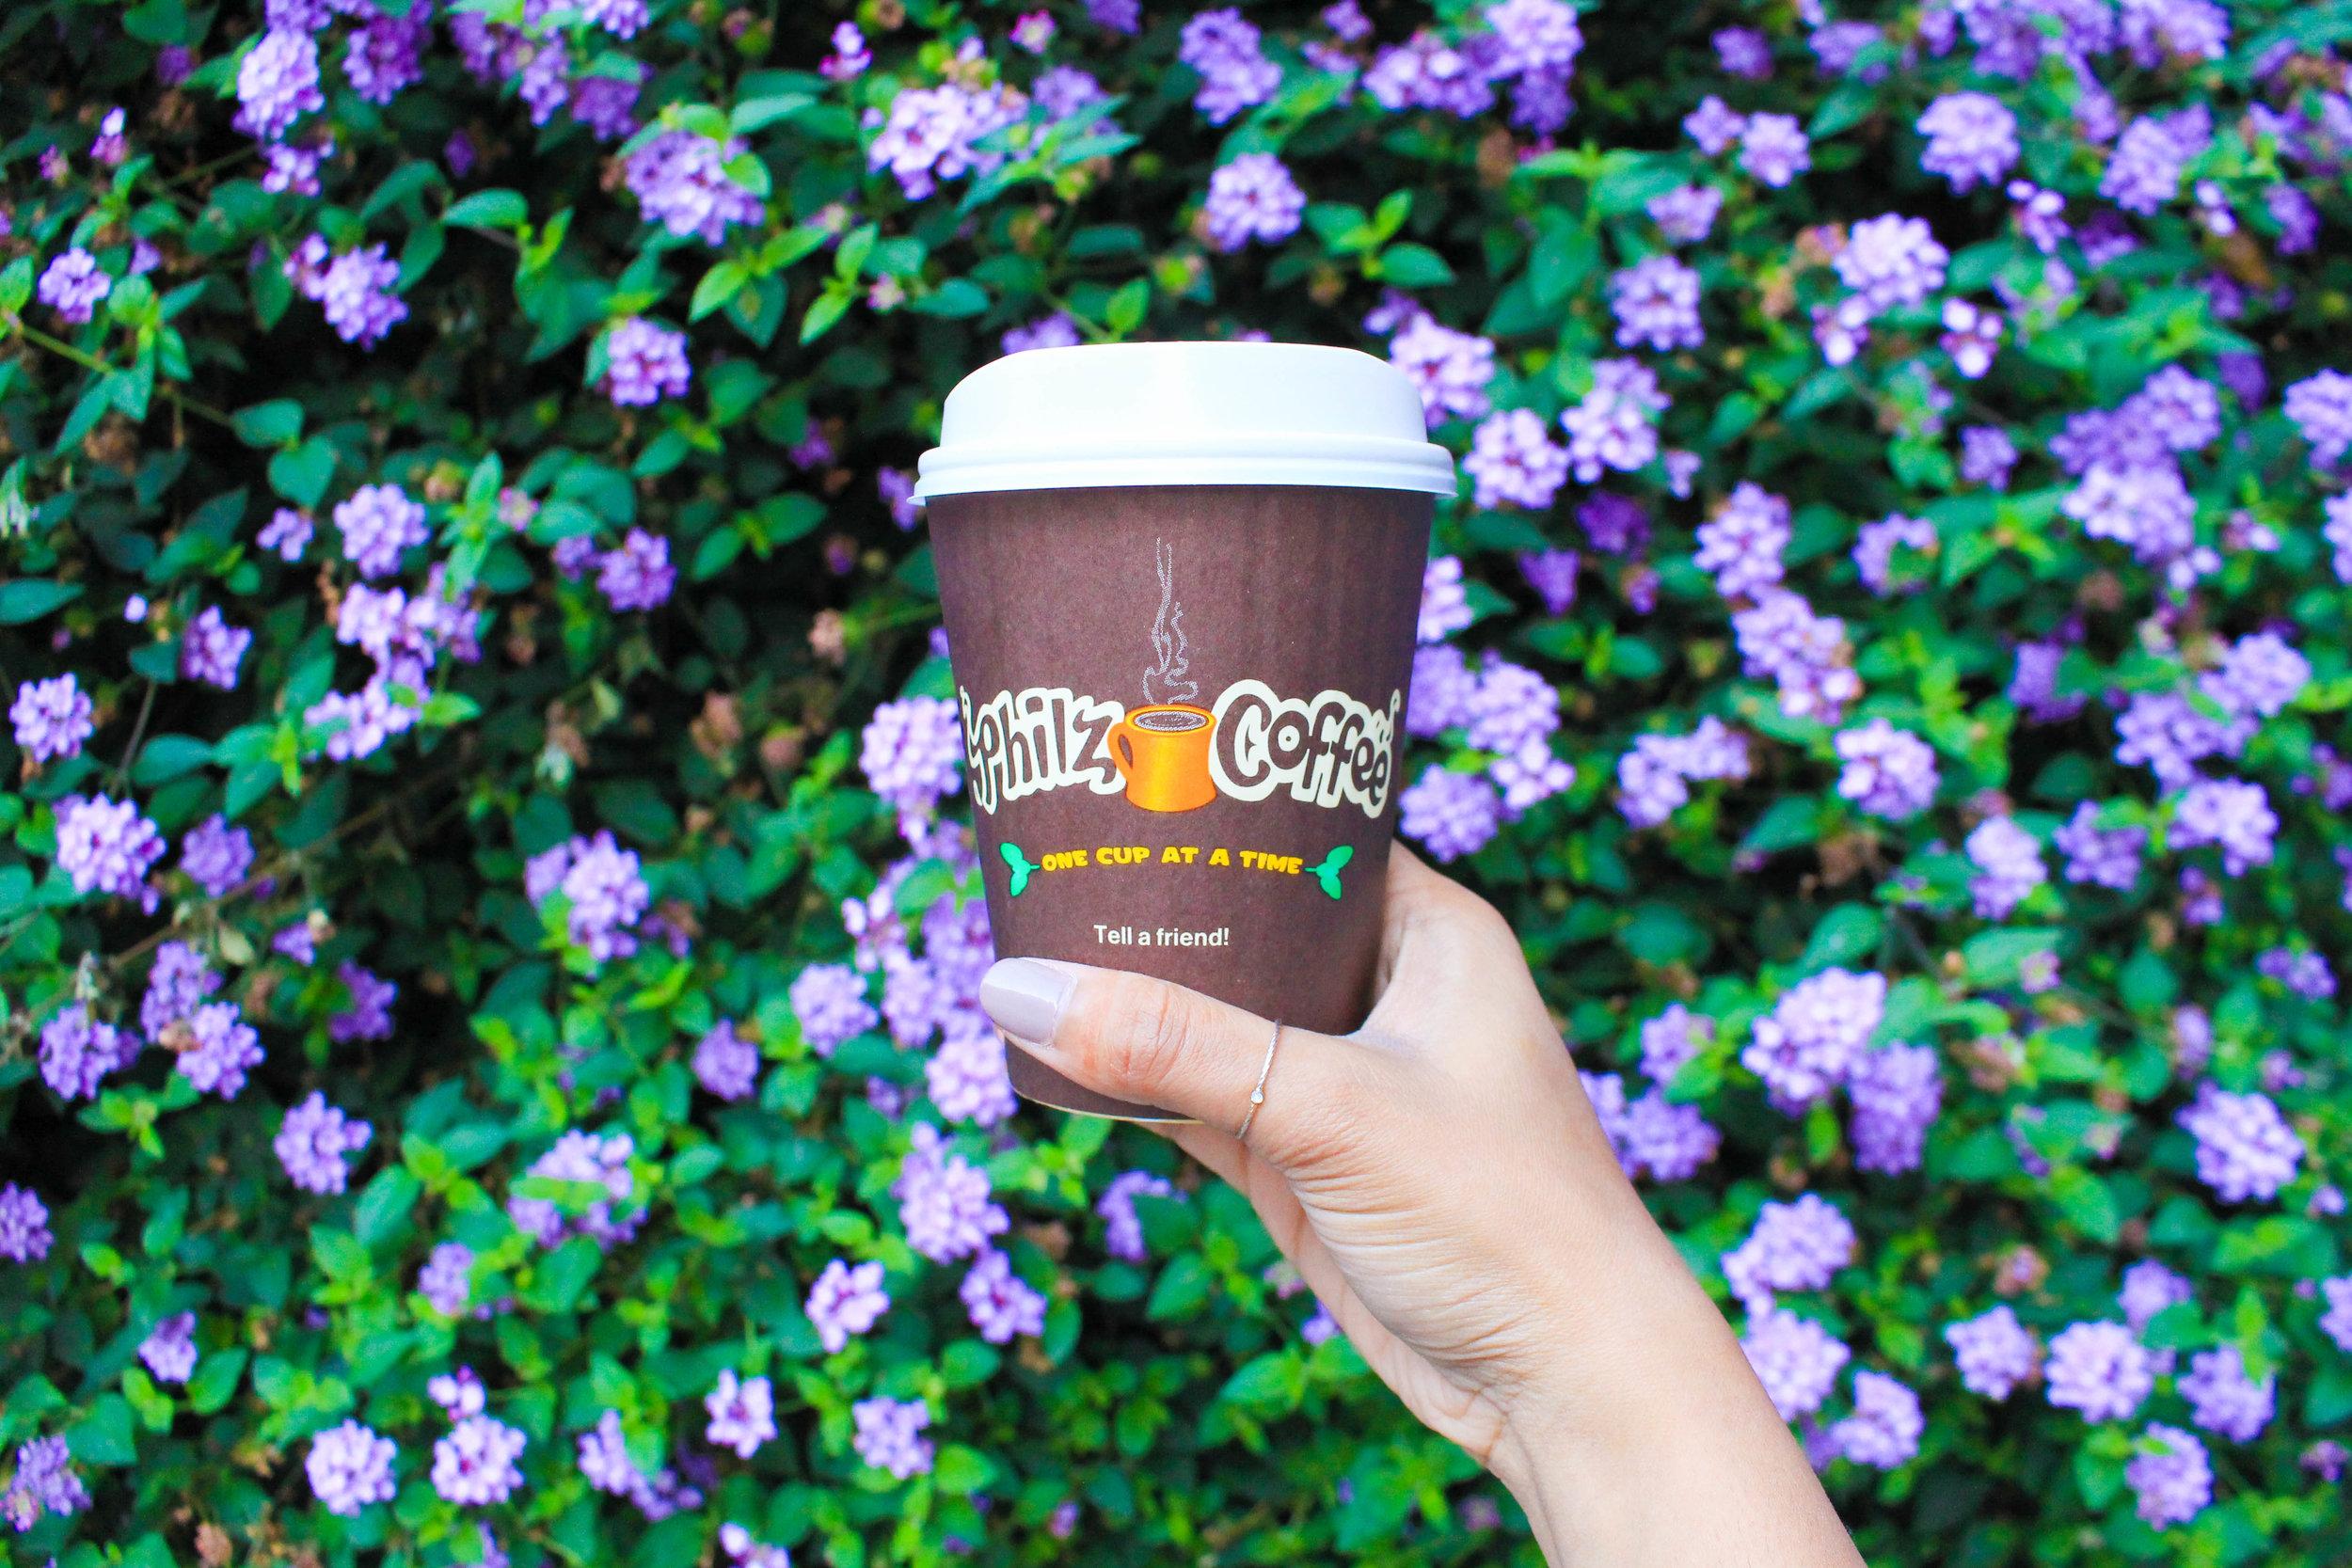 PHILZ COFFEE IN SAN FRANCISCO